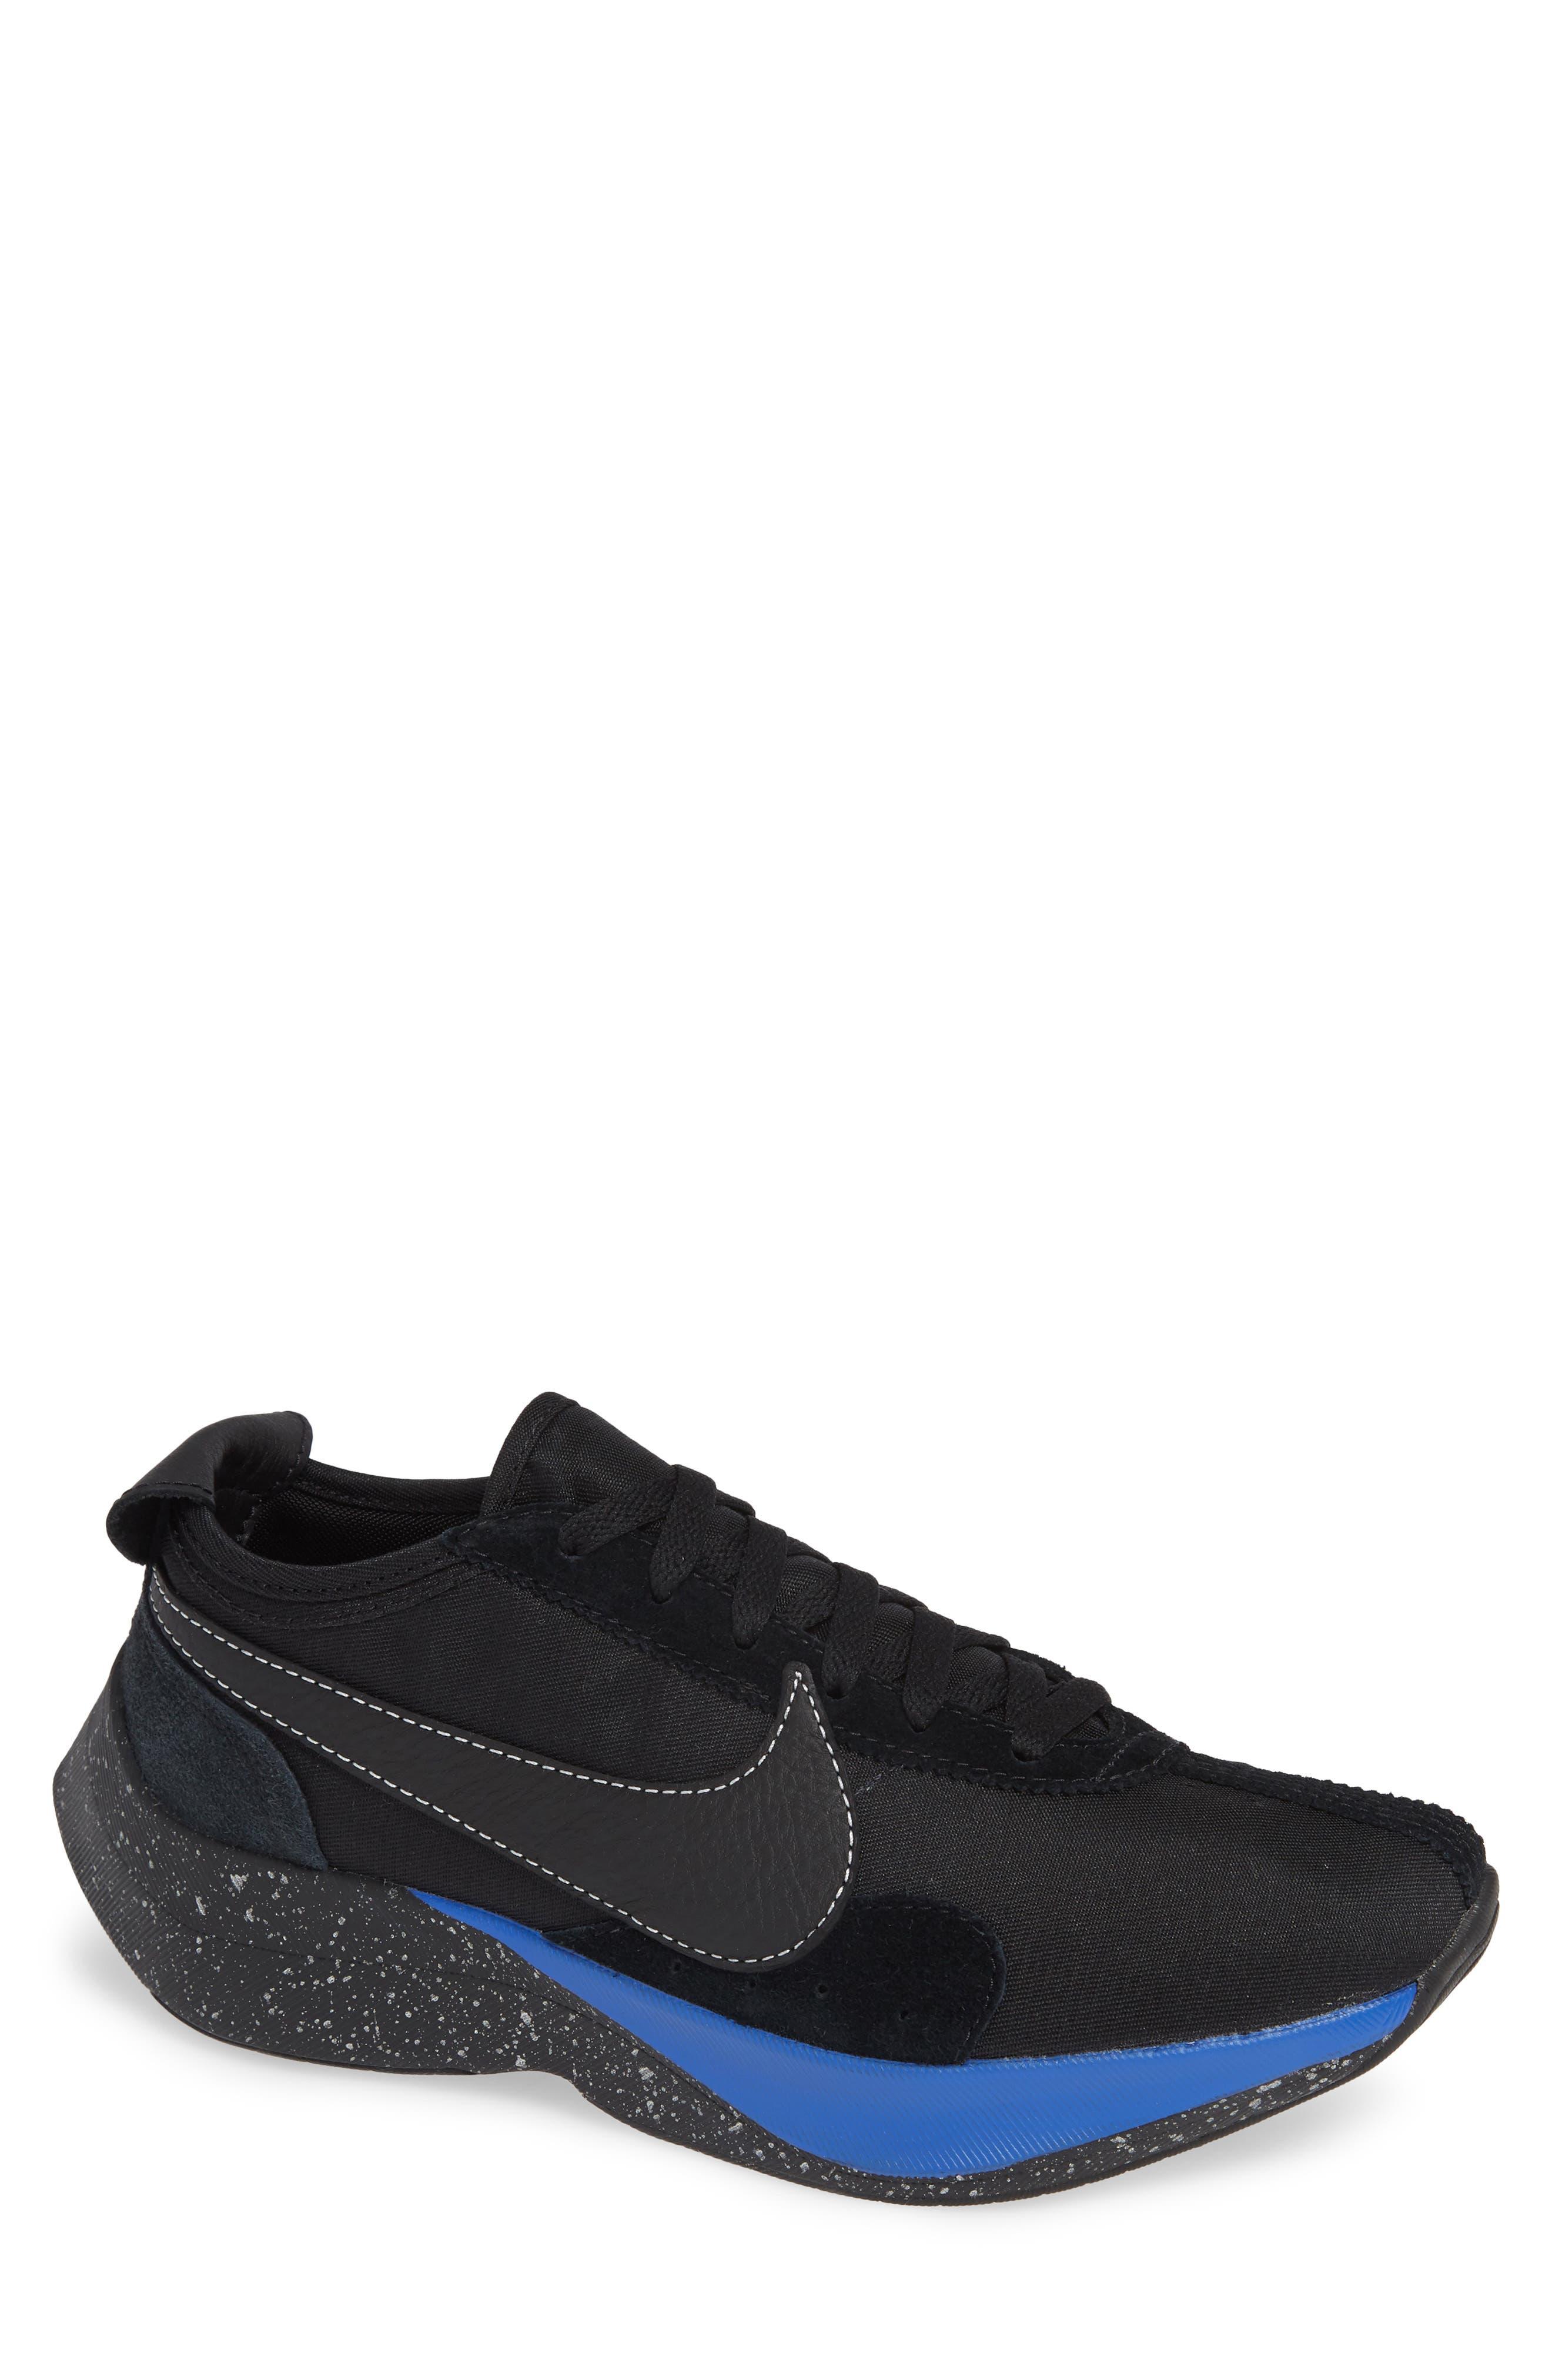 NIKE Moon Racer QS Sneaker, Main, color, 001